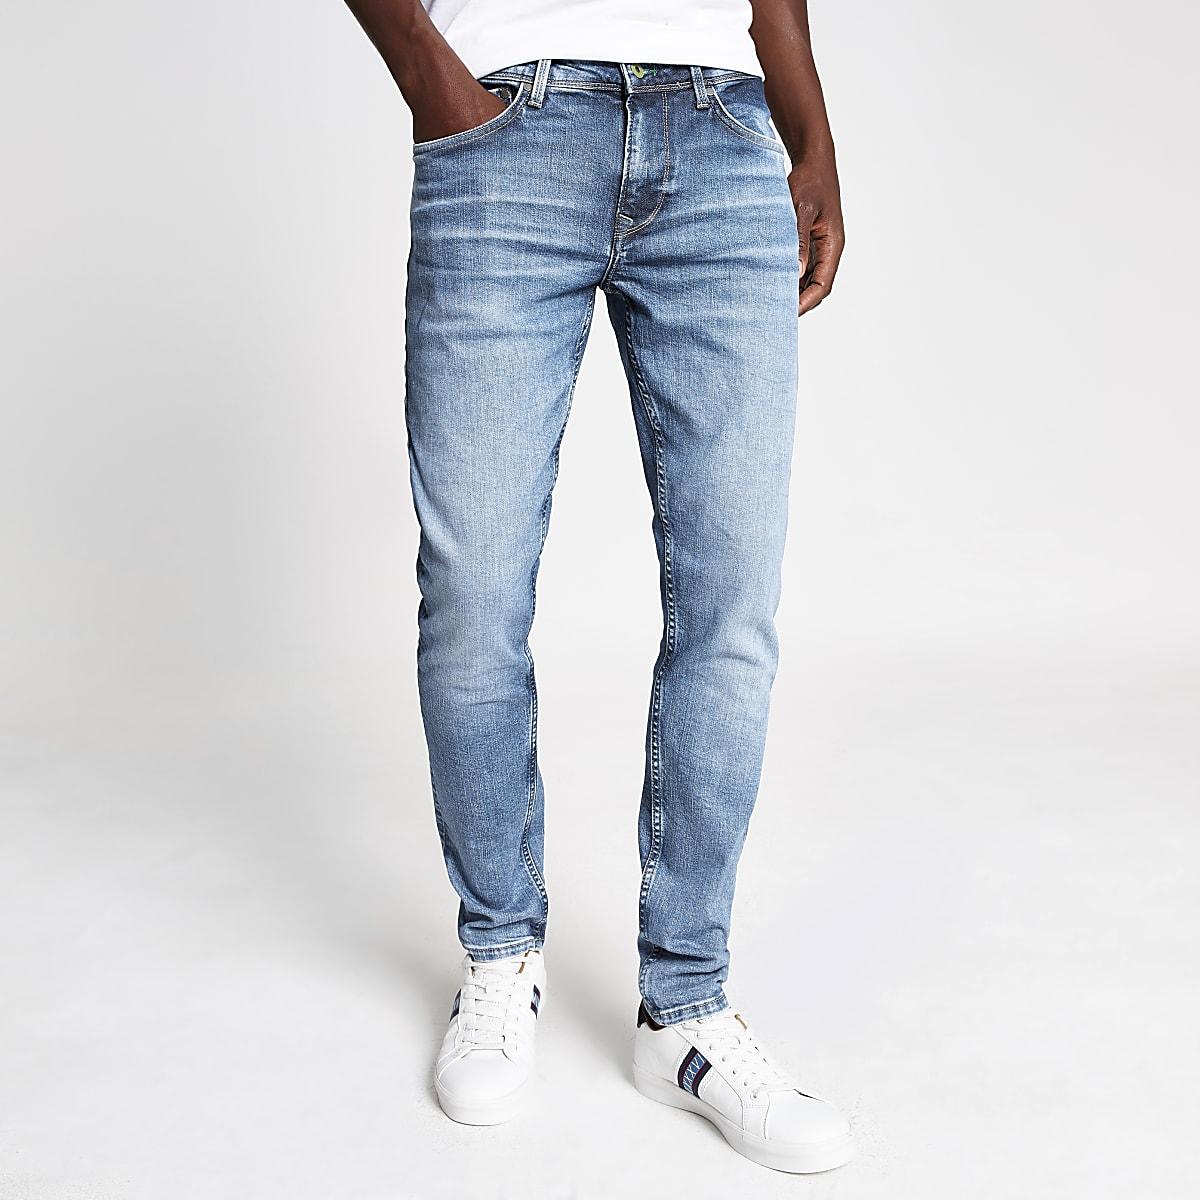 Pepe Jeans – Jean skinny bleu clair